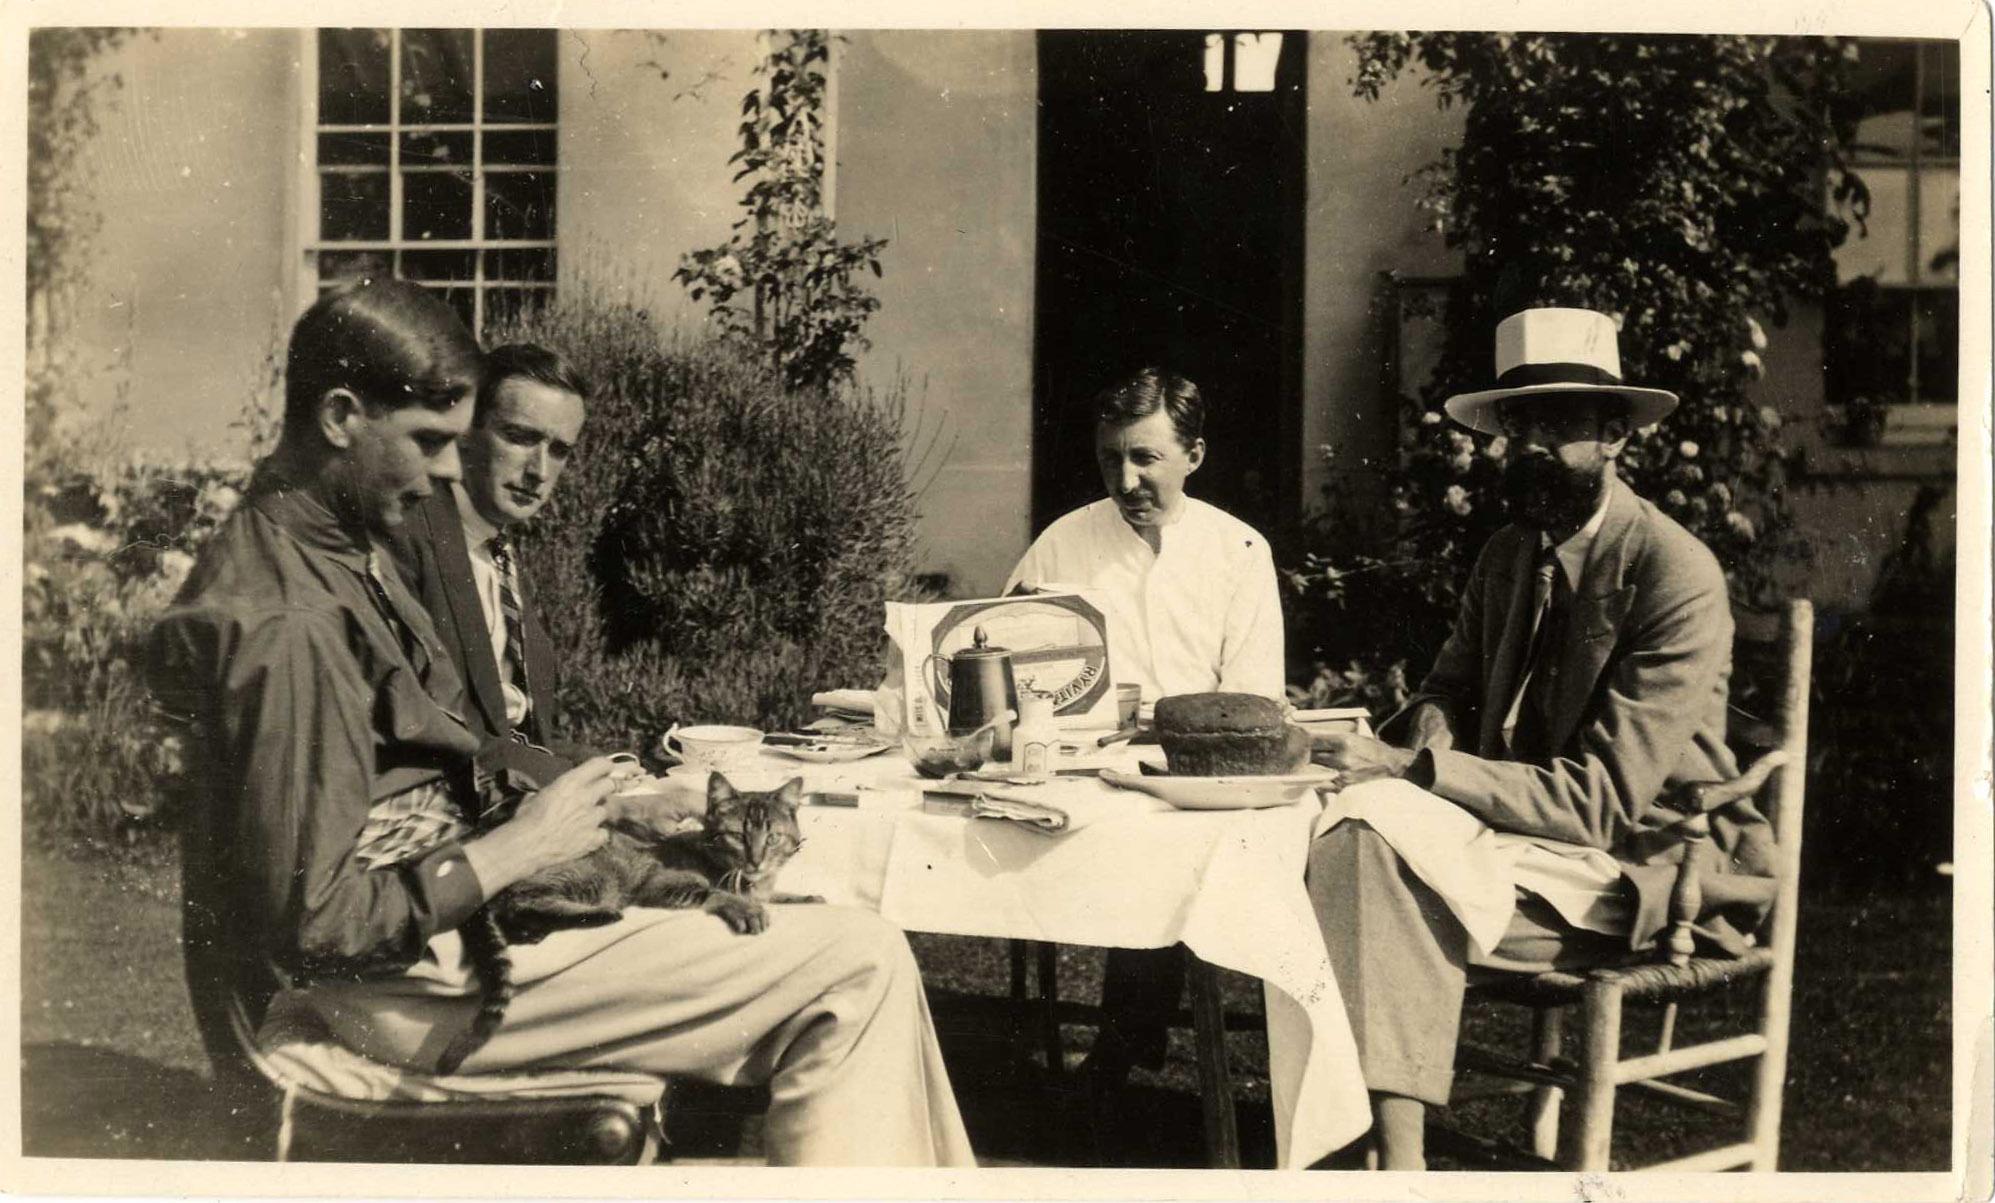 Sebastian Sprott (with the cat), Gerald Heard, EM Forster and Lytton Strachey, at Ham Spray House, 1920s. (EMF/27/351)